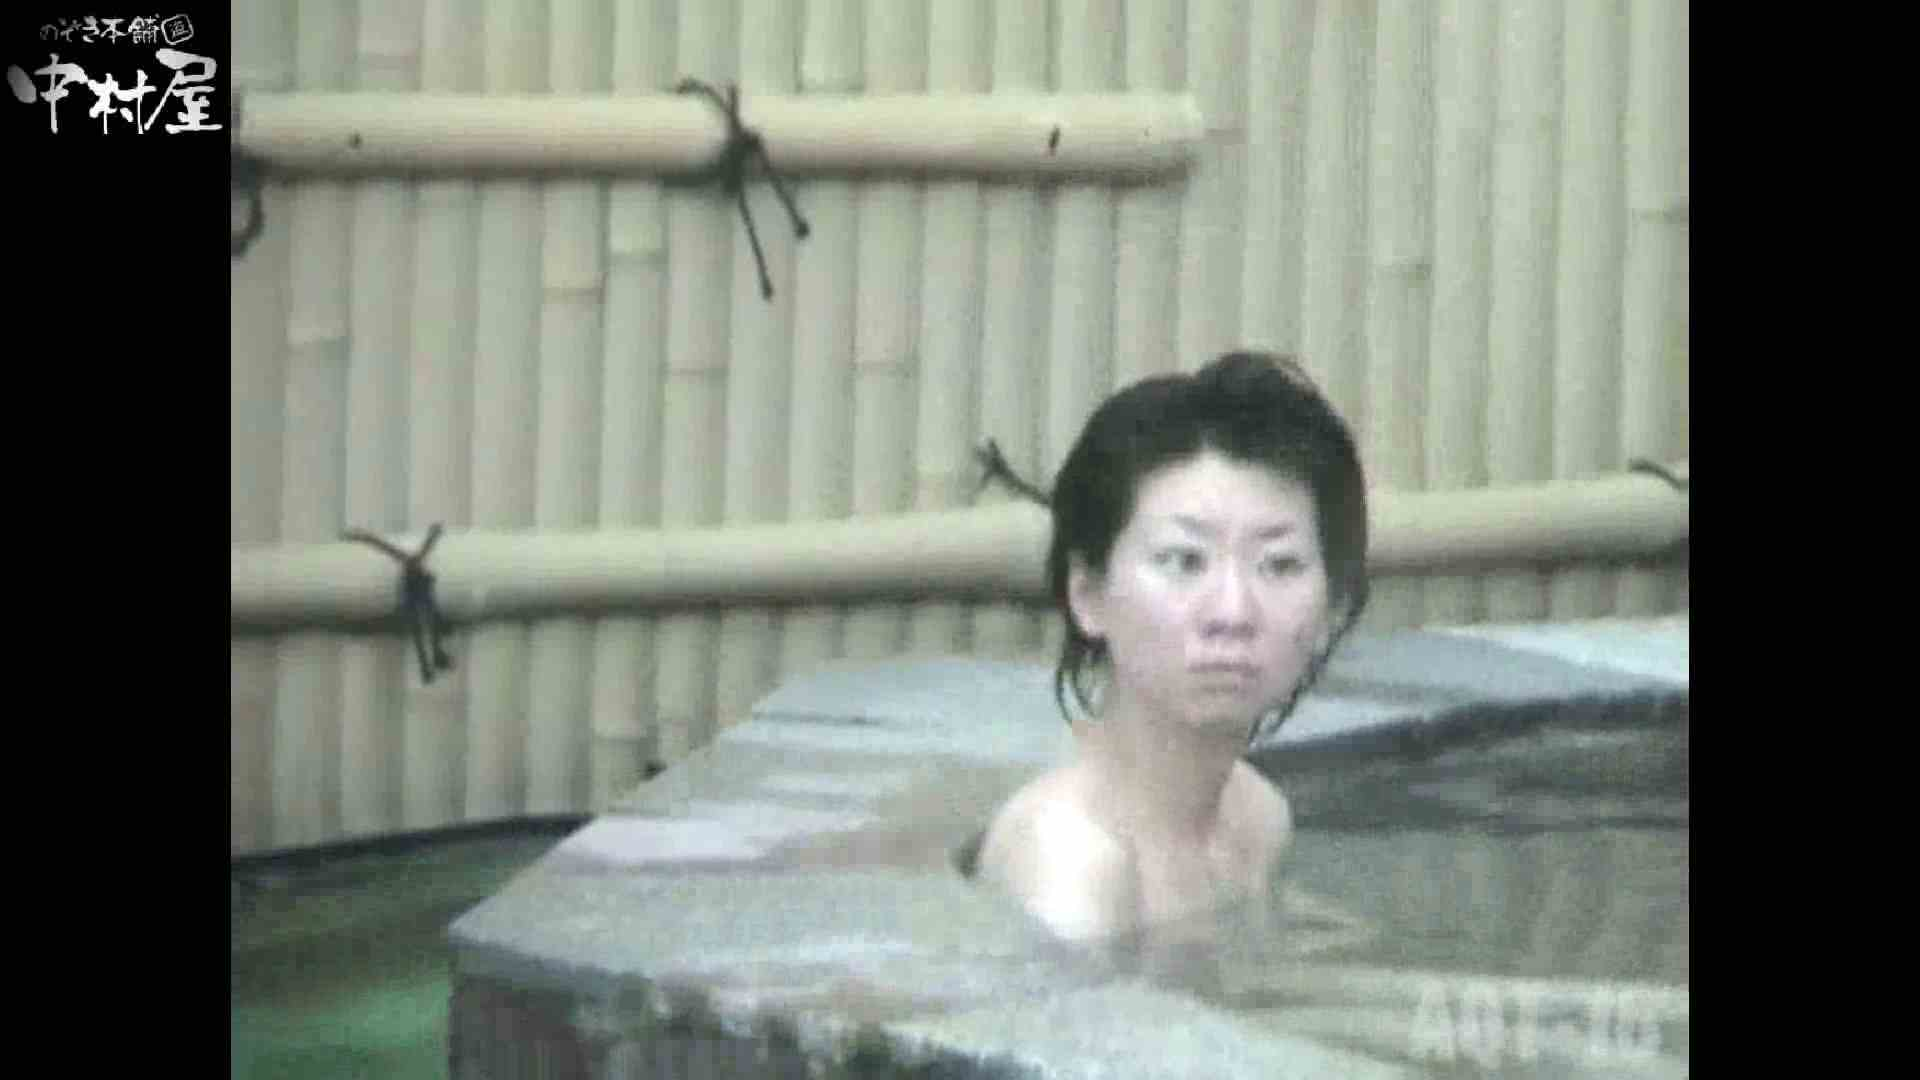 Aquaな露天風呂Vol.880潜入盗撮露天風呂十六判湯 其の三 潜入画像 | 露天  78画像 50